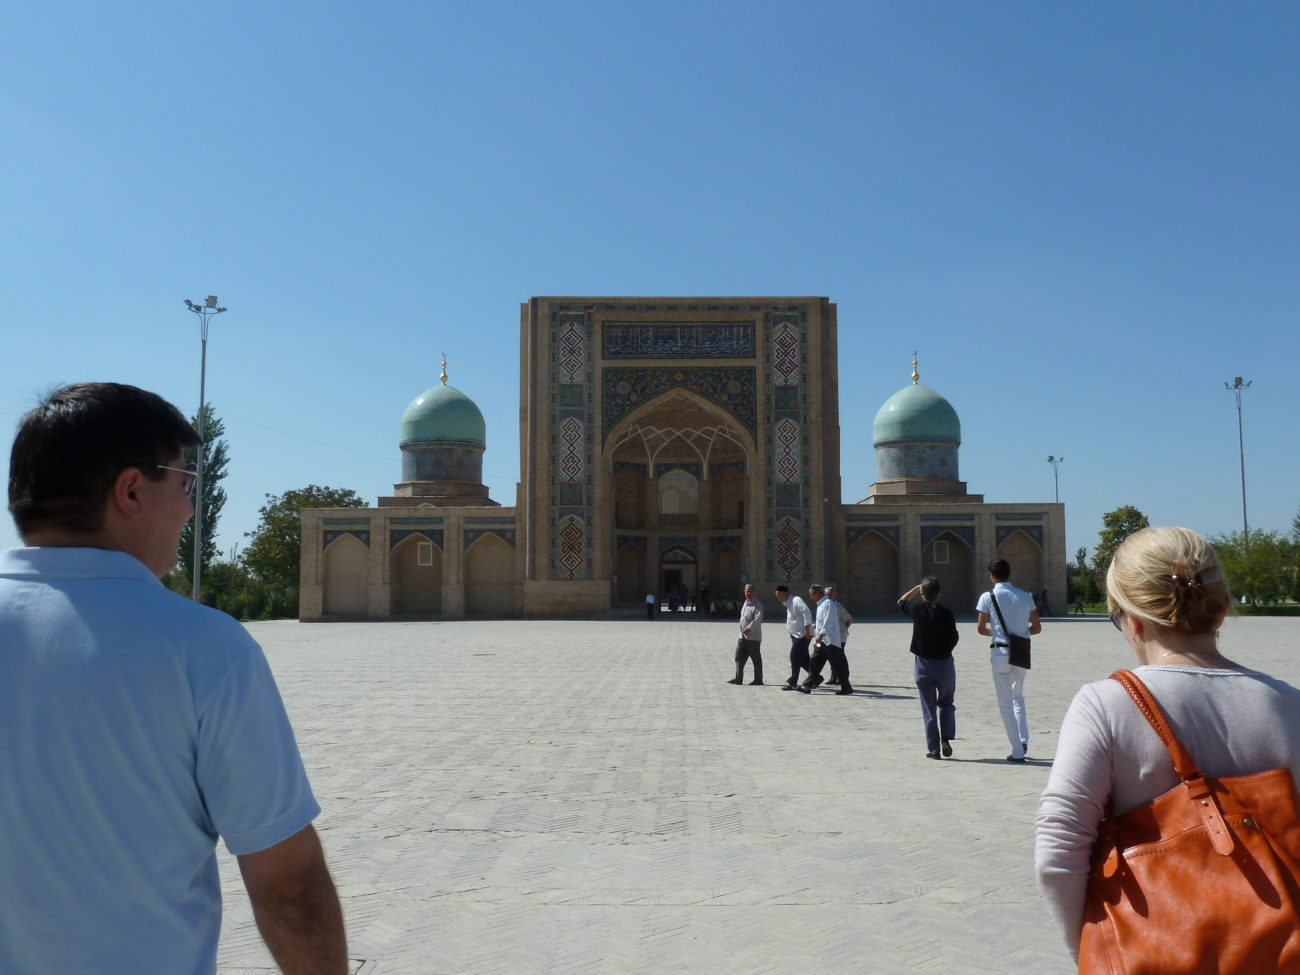 Asie centrale Etats-Unis Chine Influence Diplomatie